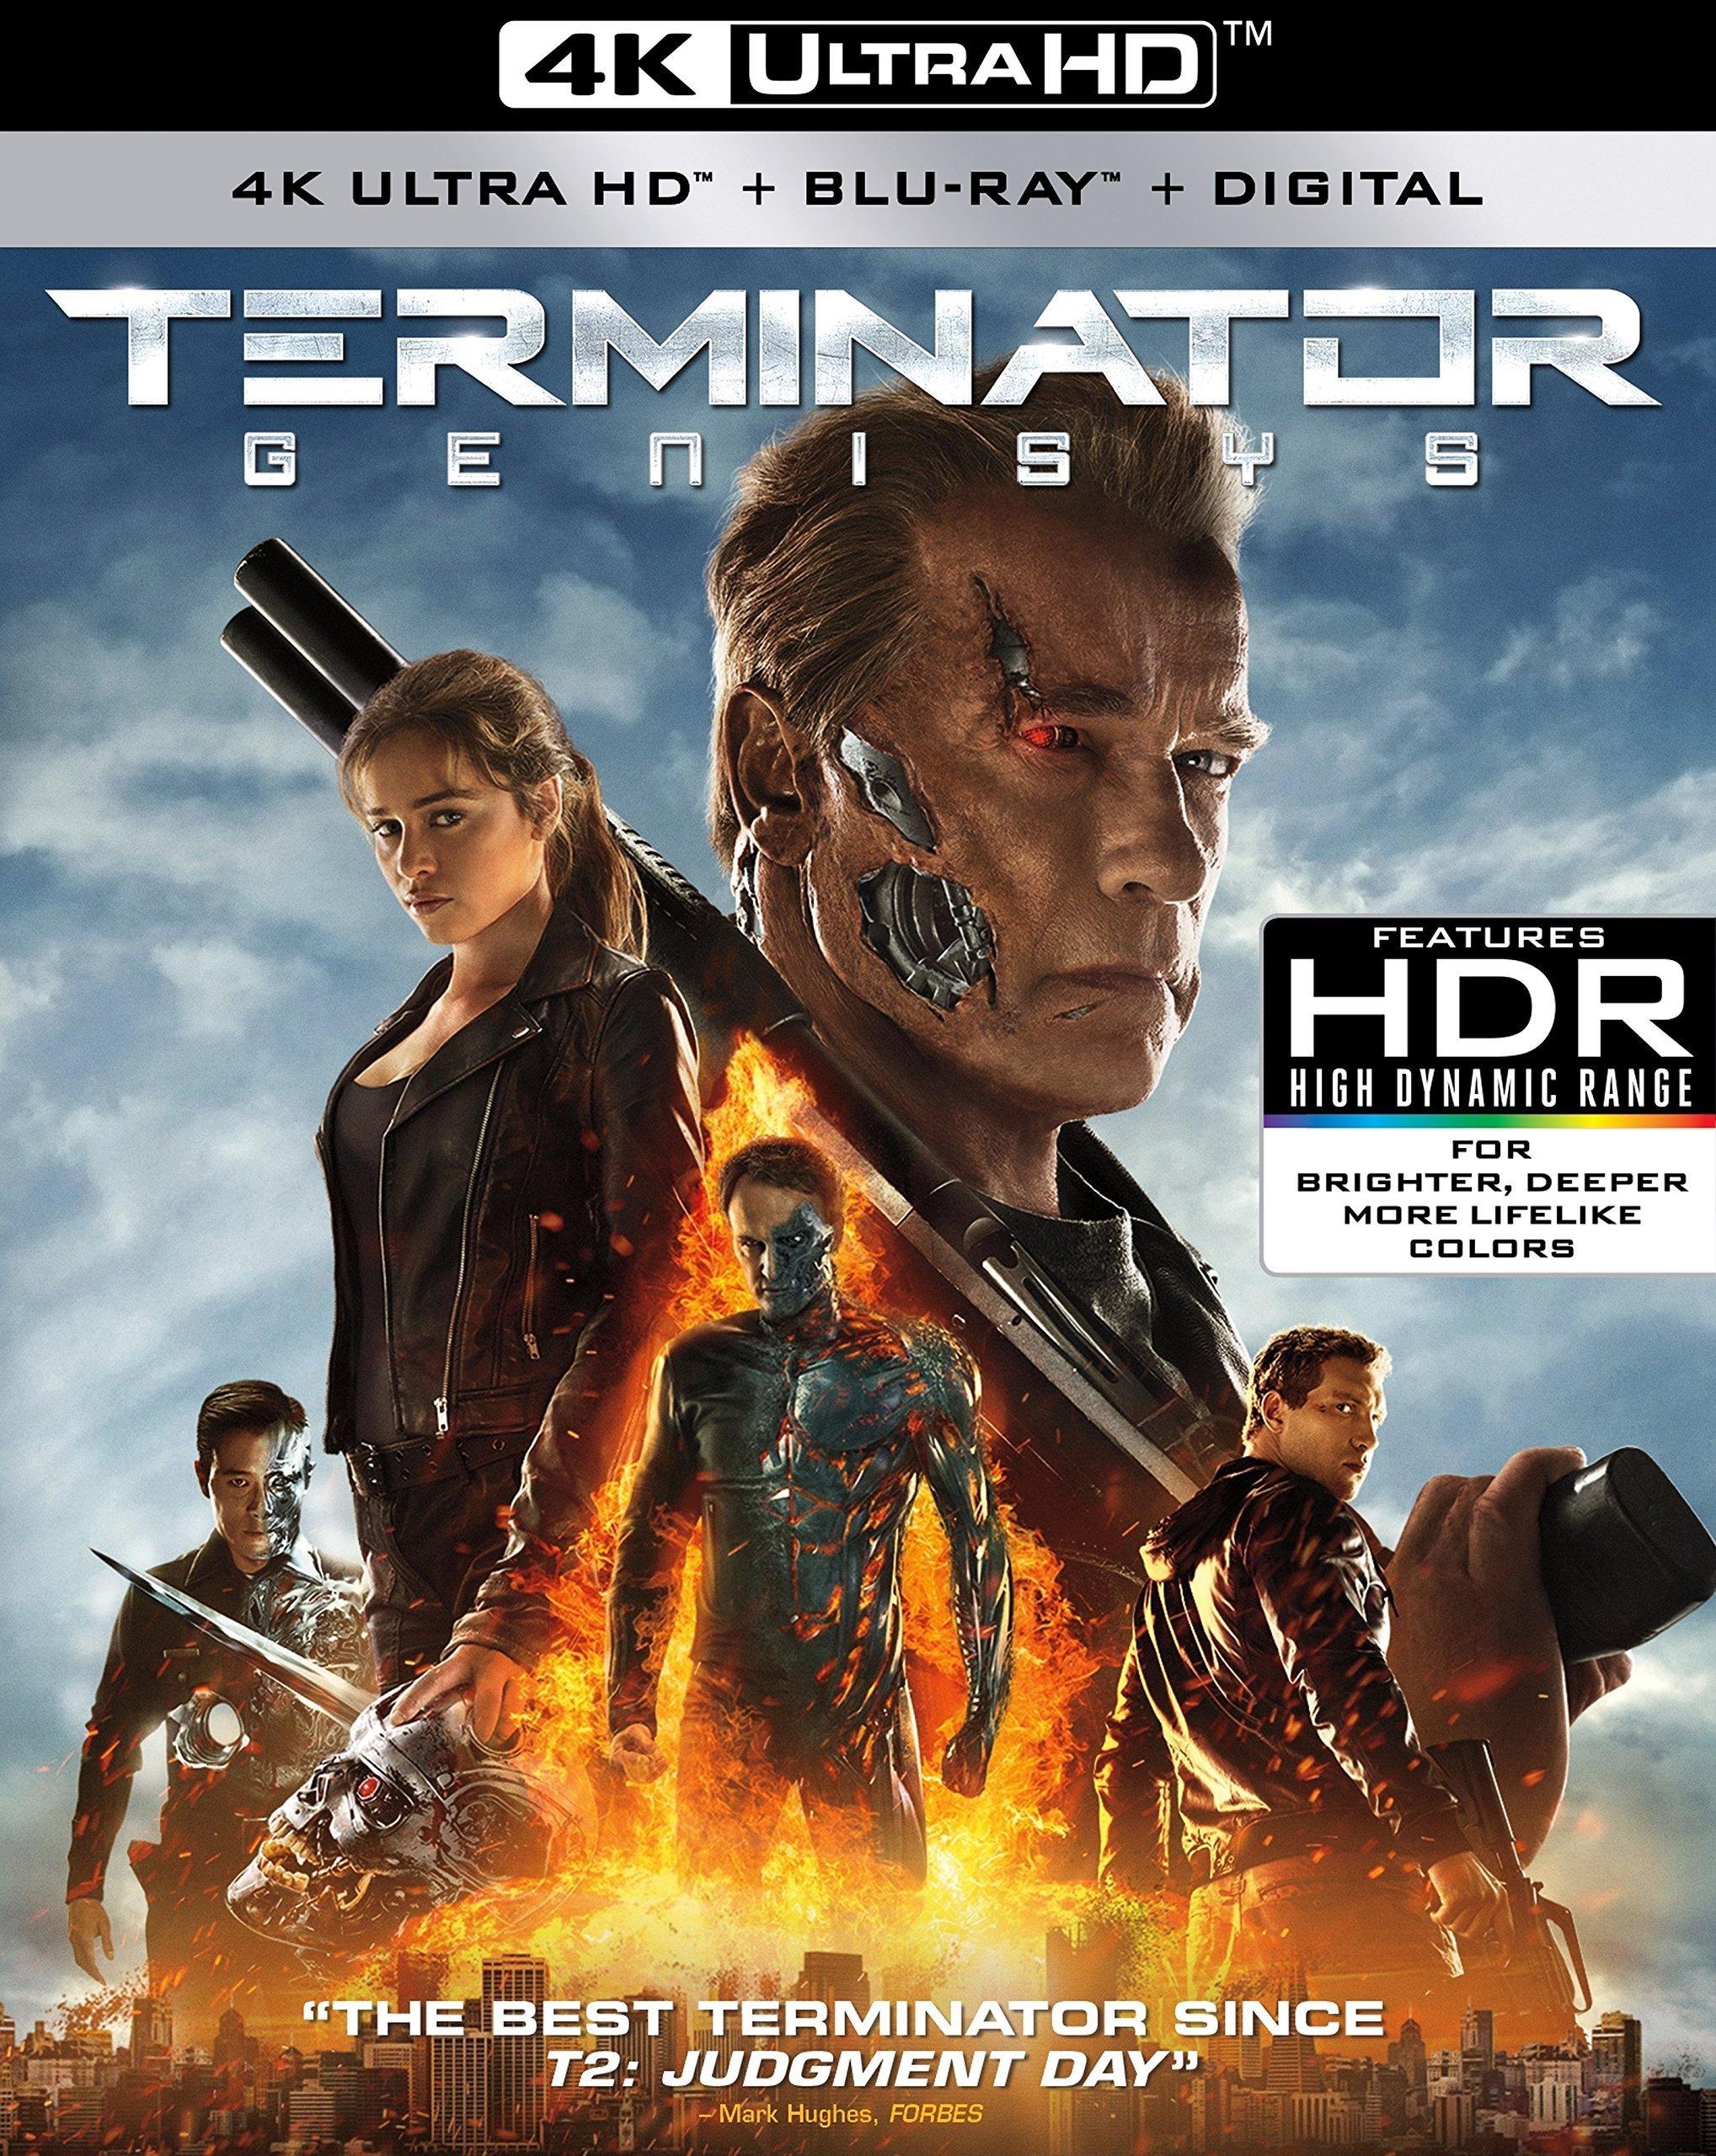 Terminator Genisys 4K (2015) Ultra HD Blu-ray